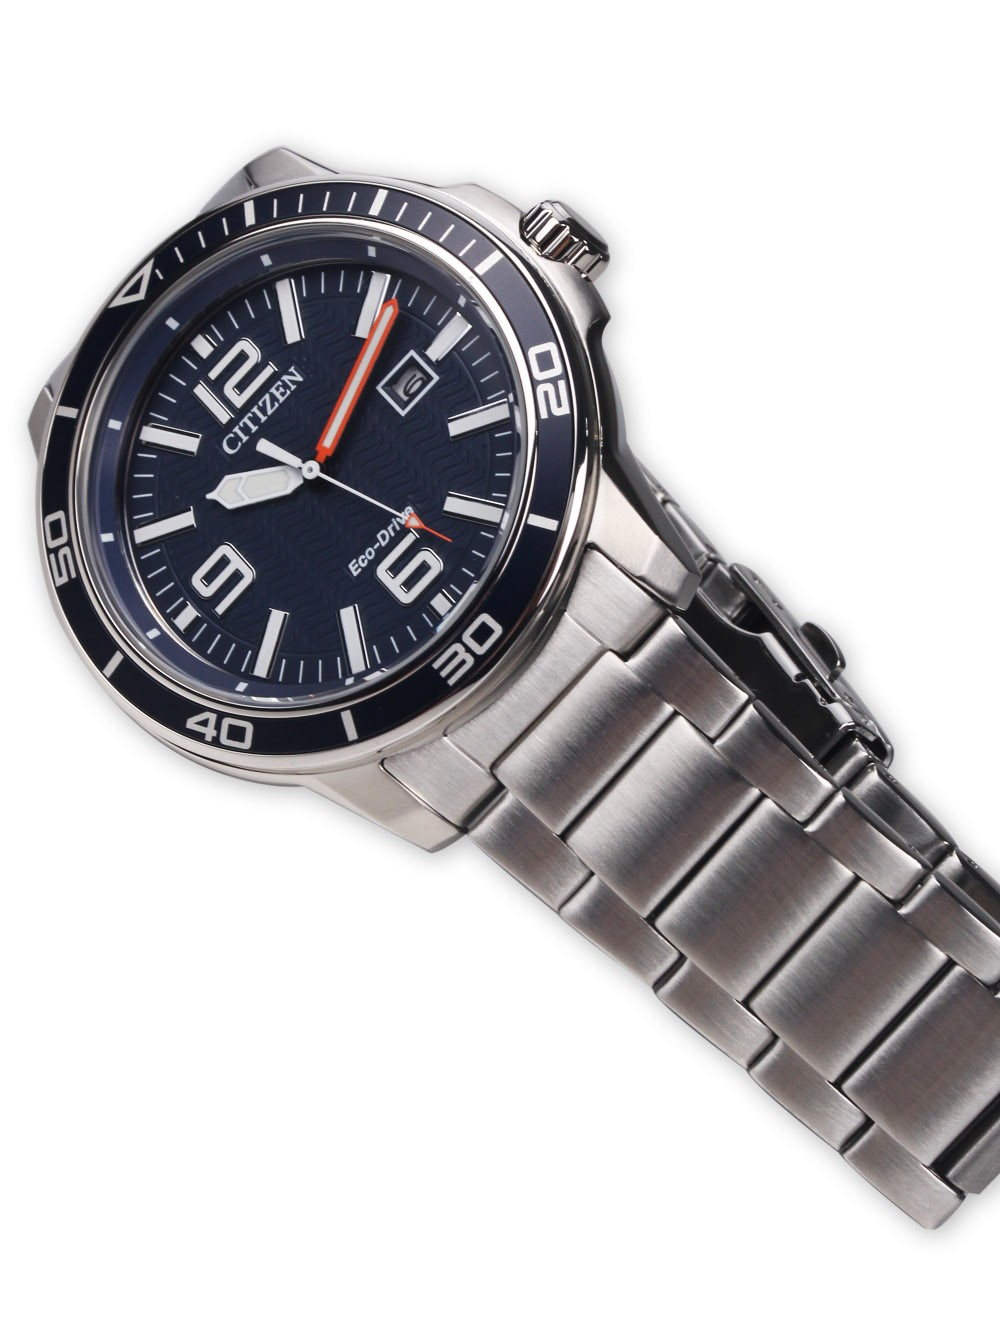 watches chrono12 citizen aw1520 51l sport eco drive